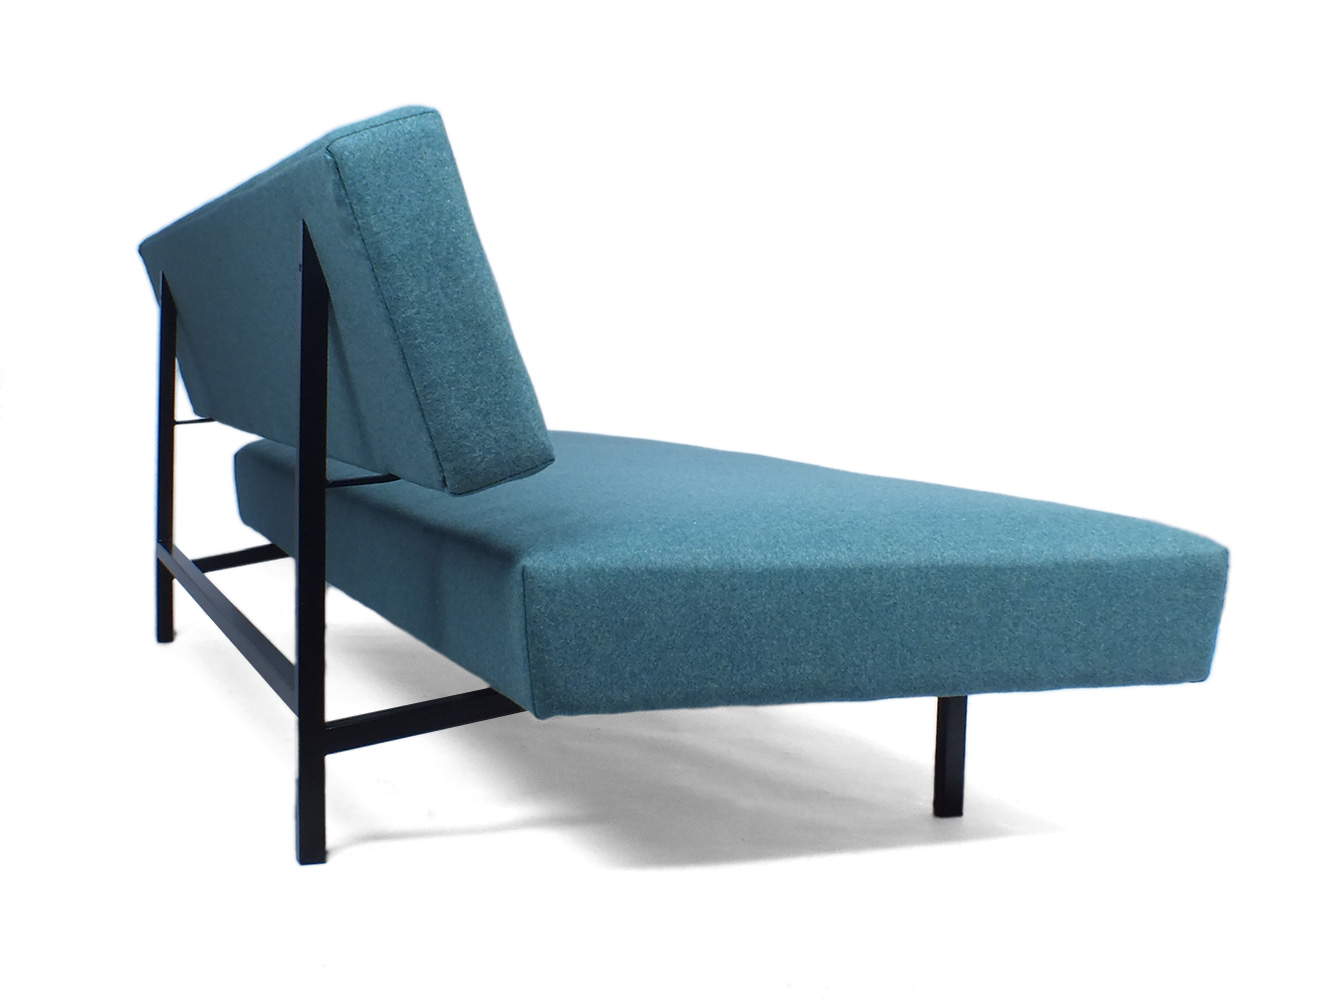 Seats And Sofas Slaapbank.Sofa Bed Doublet Rob Parry Gelderland Vaen